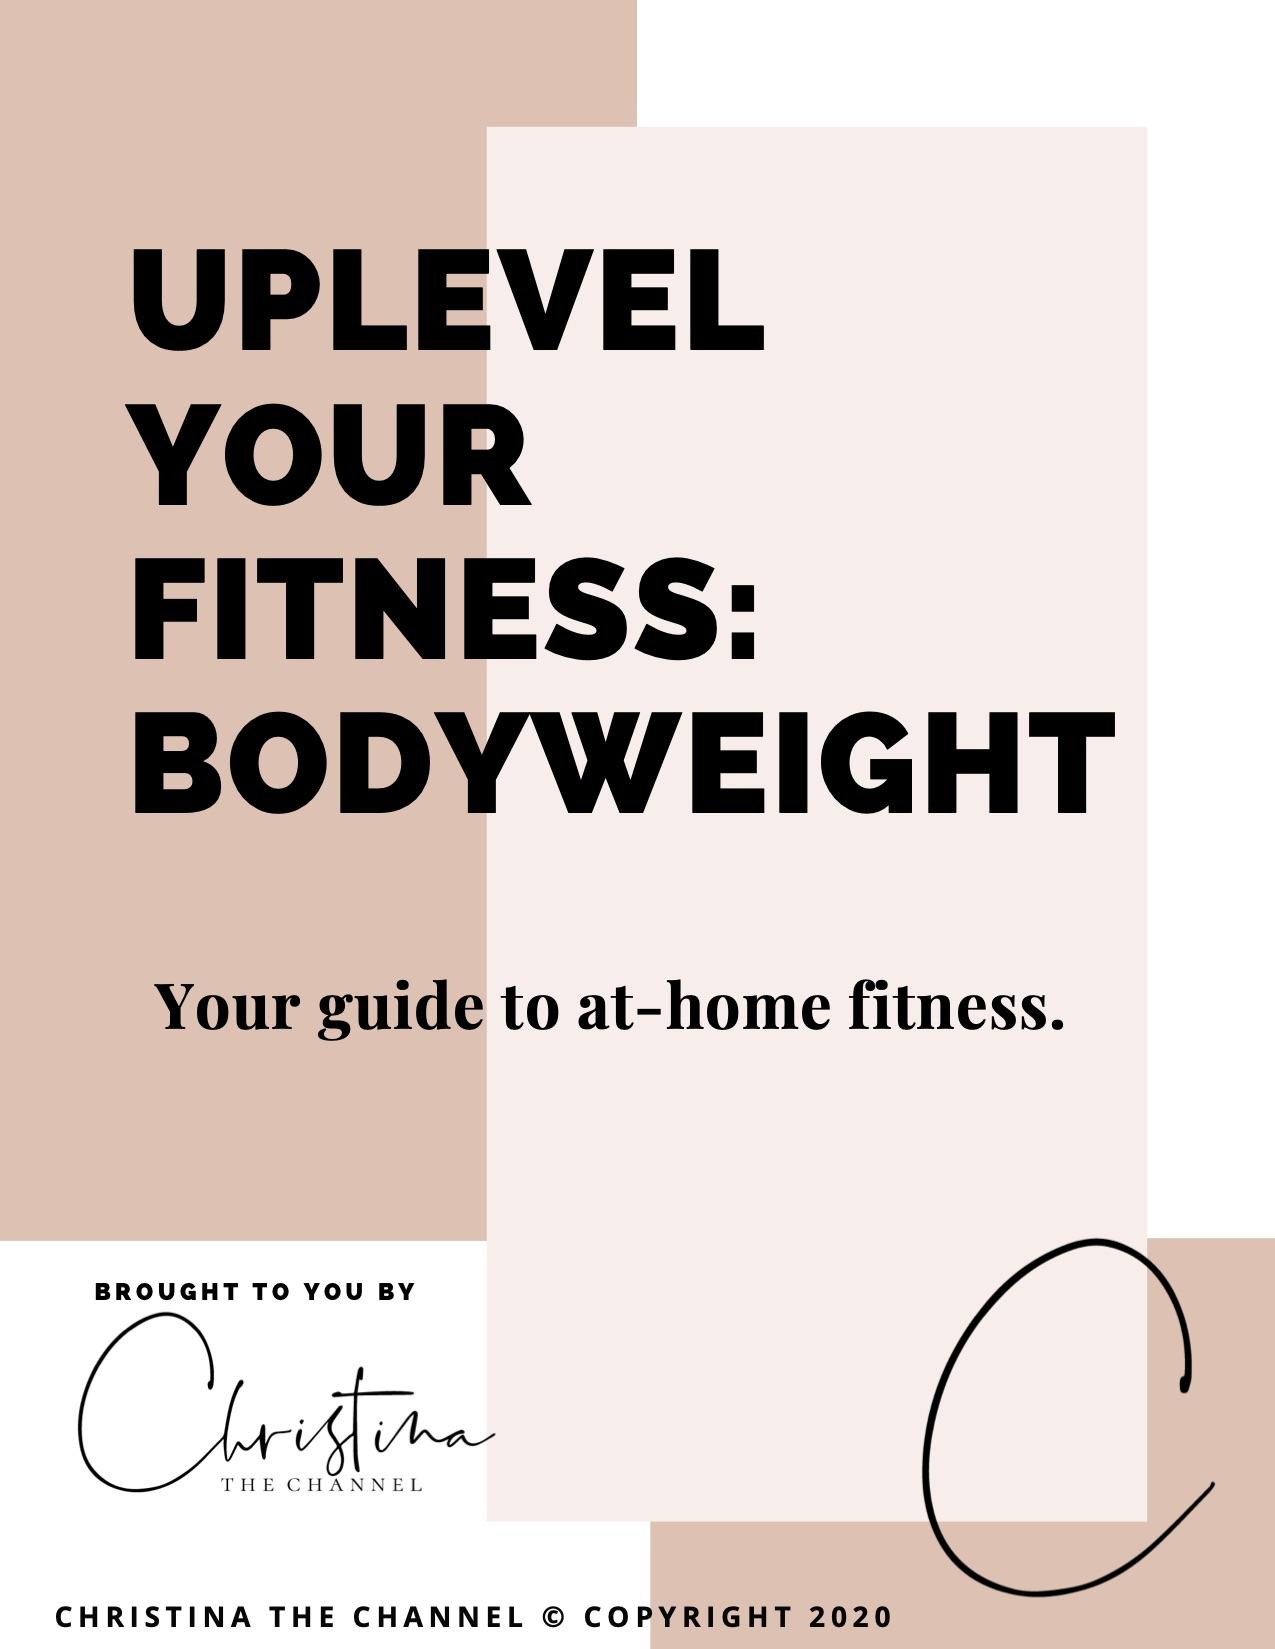 UPLEVEL Fitness - Bodyweight